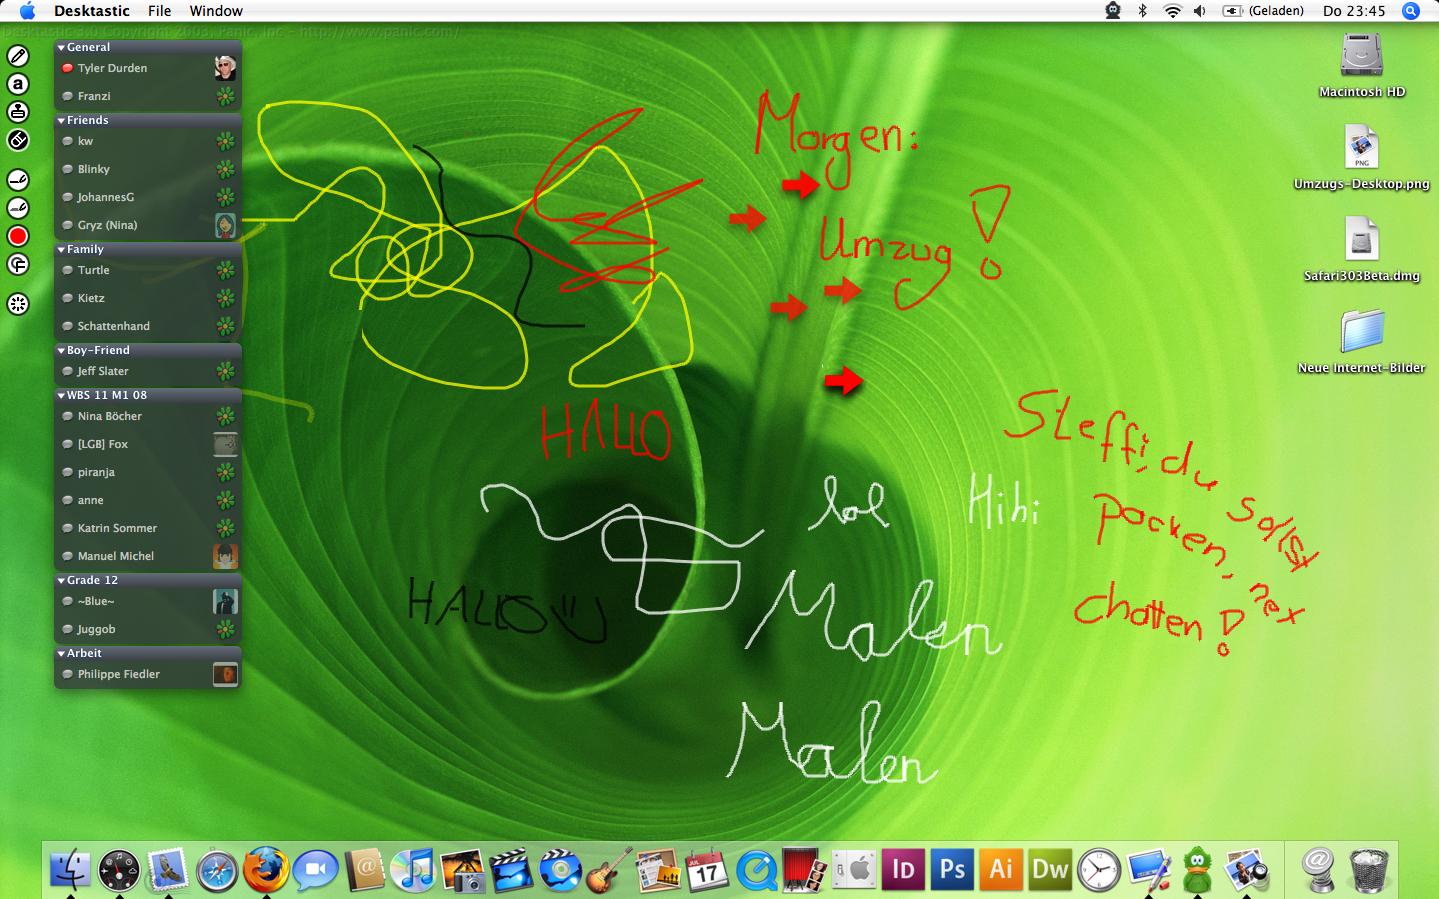 Desktop: Umzug